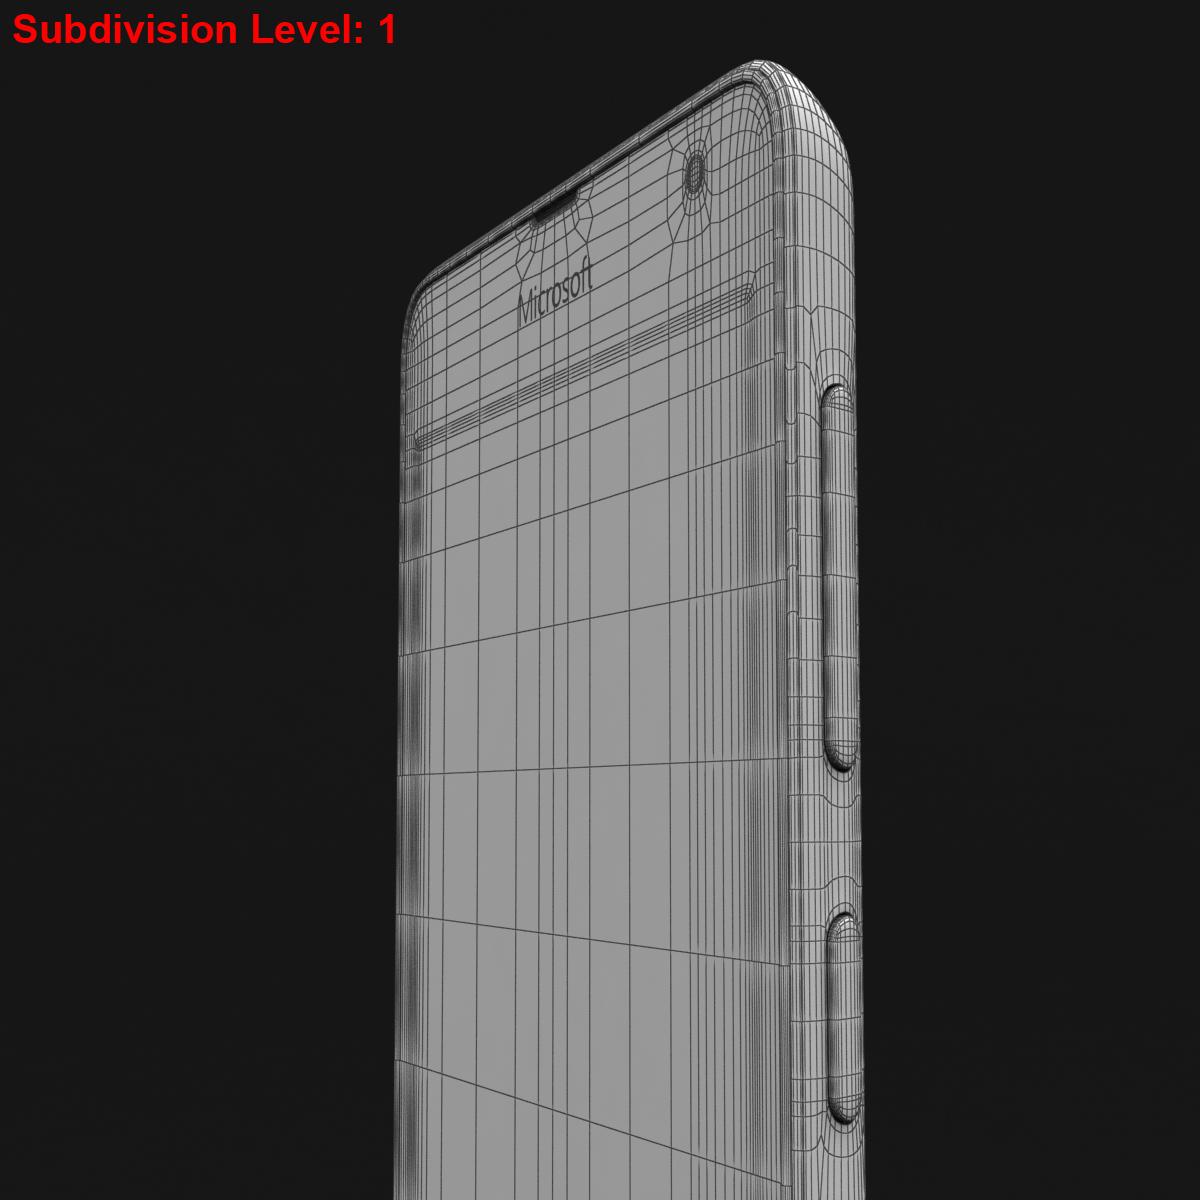 microsoft lumia 535 and dual sim black 3d model 3ds max fbx c4d obj 204368